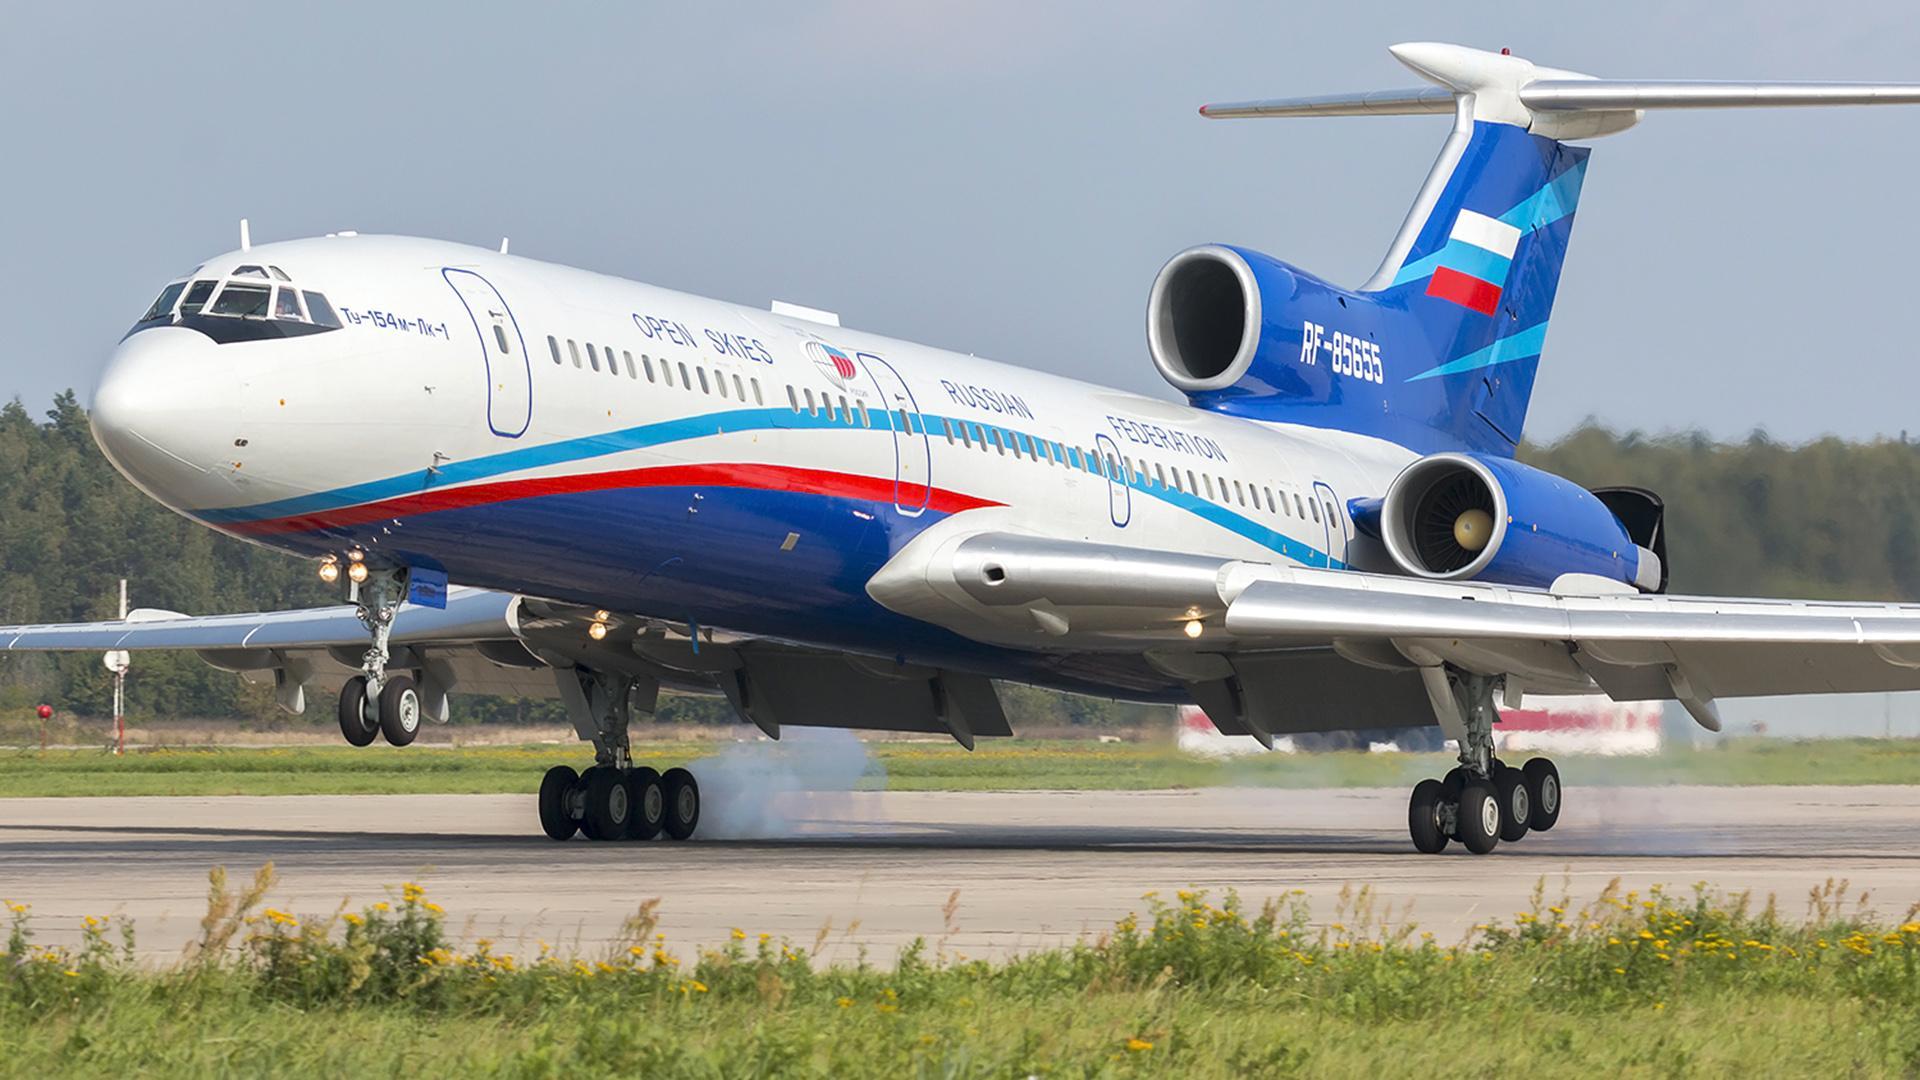 Открытое небо Tupolev_Tu-154M-Lk-1_1